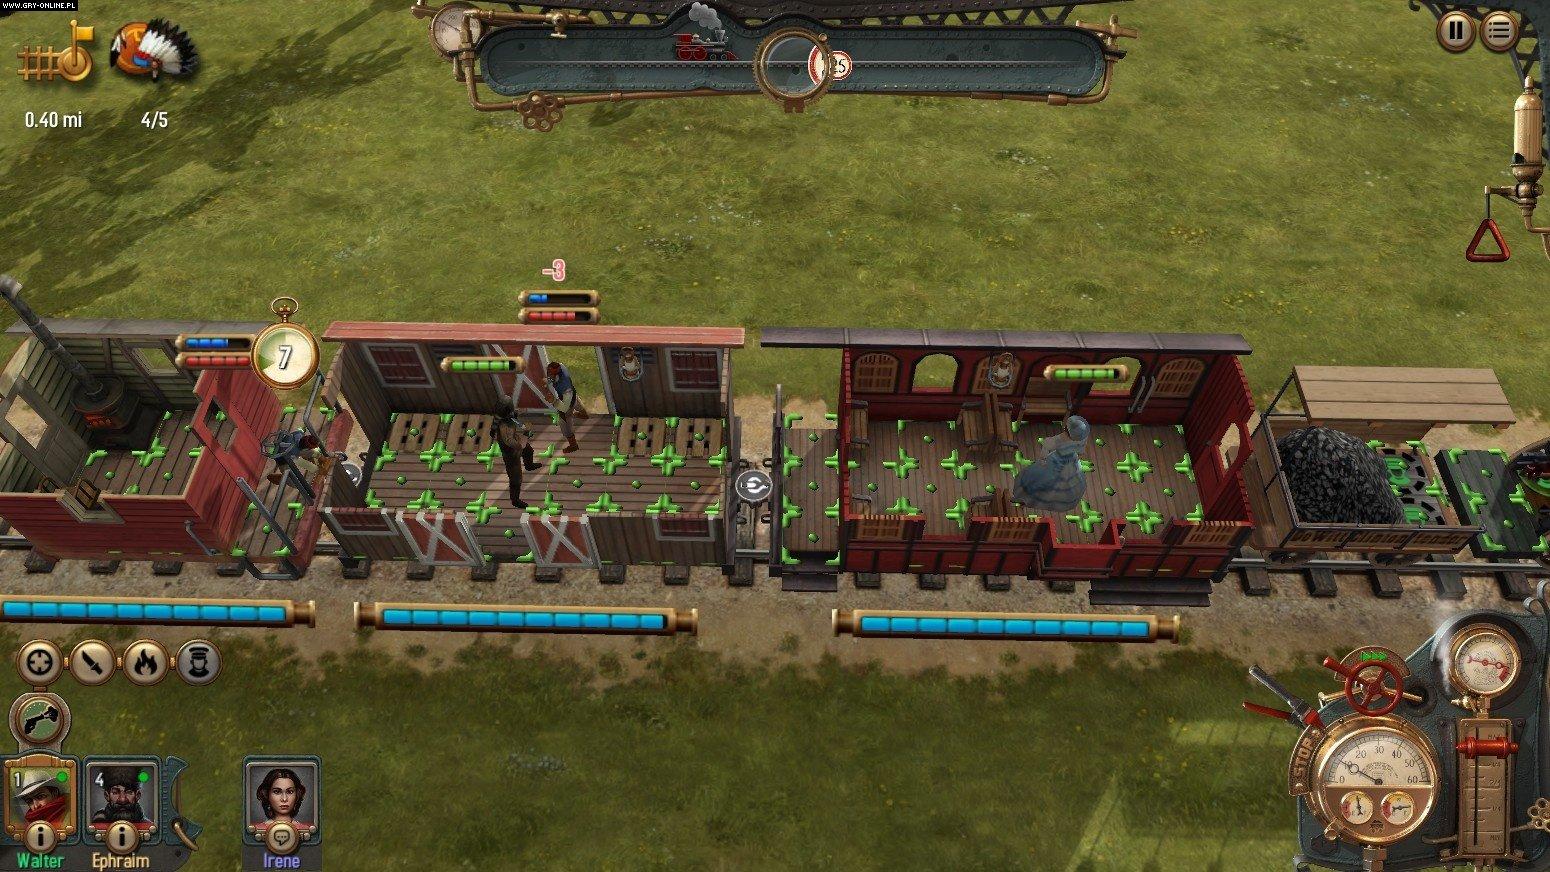 Bounty Train PC Games Image 3/26, Corbie Games, Daedalic Entertainment